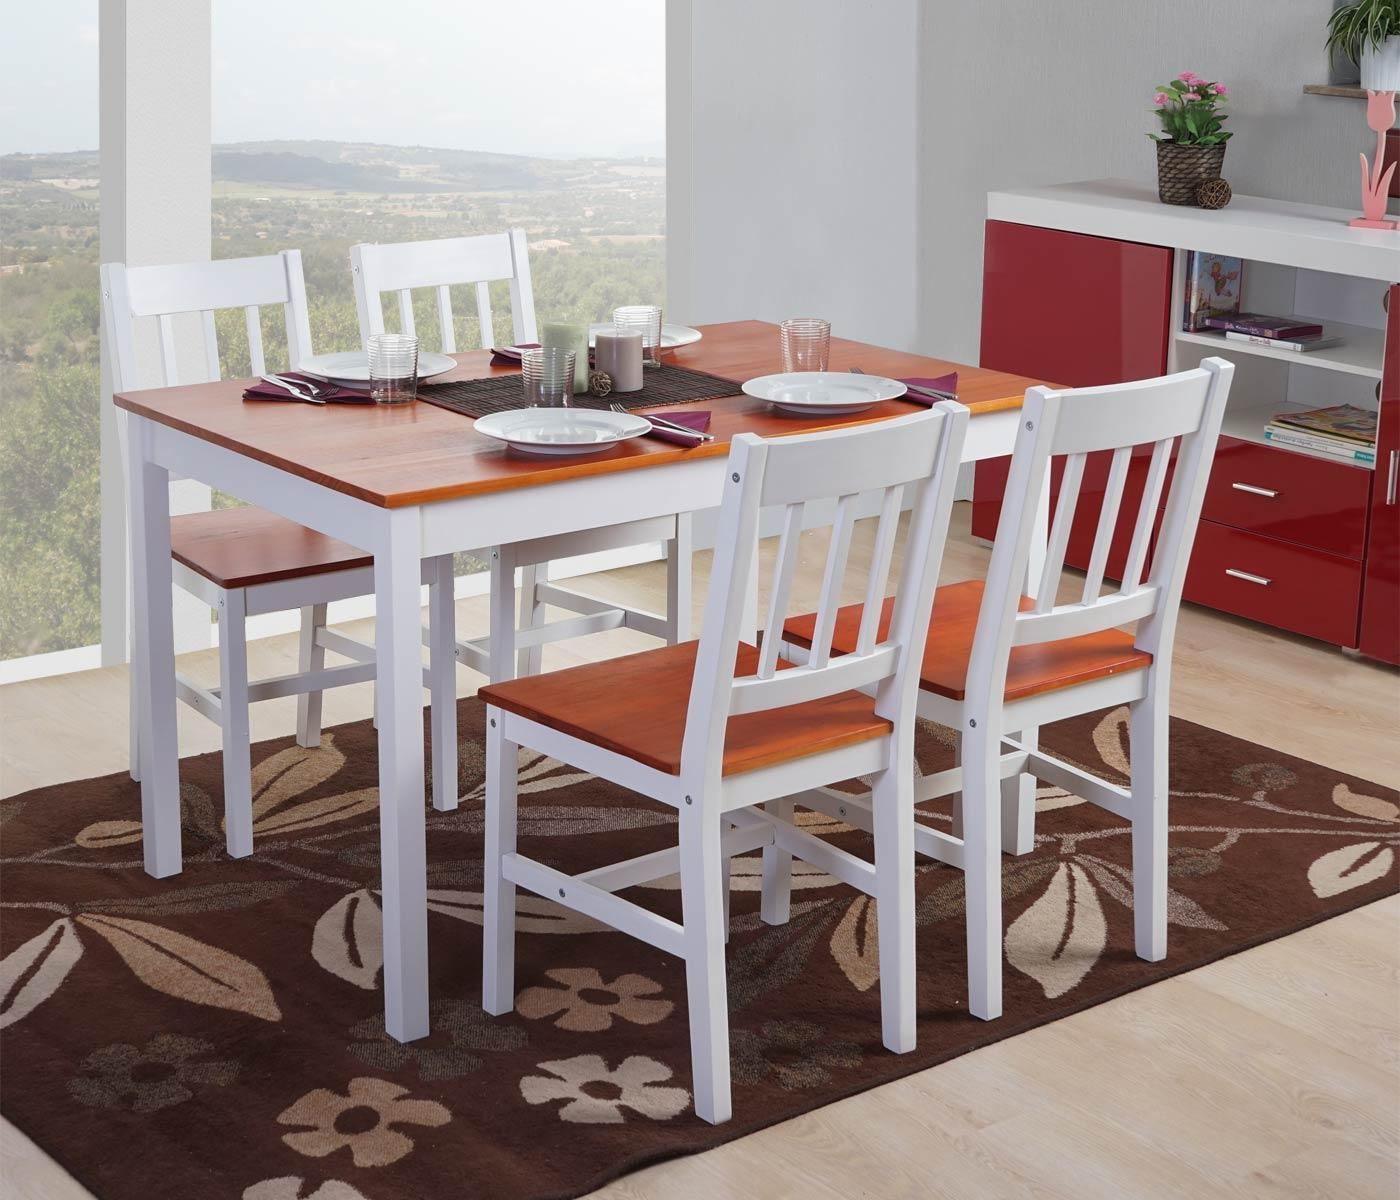 Conjunto mesa 4 sillas de cocina o comedor nerja en - Mesas de cocina bricor ...